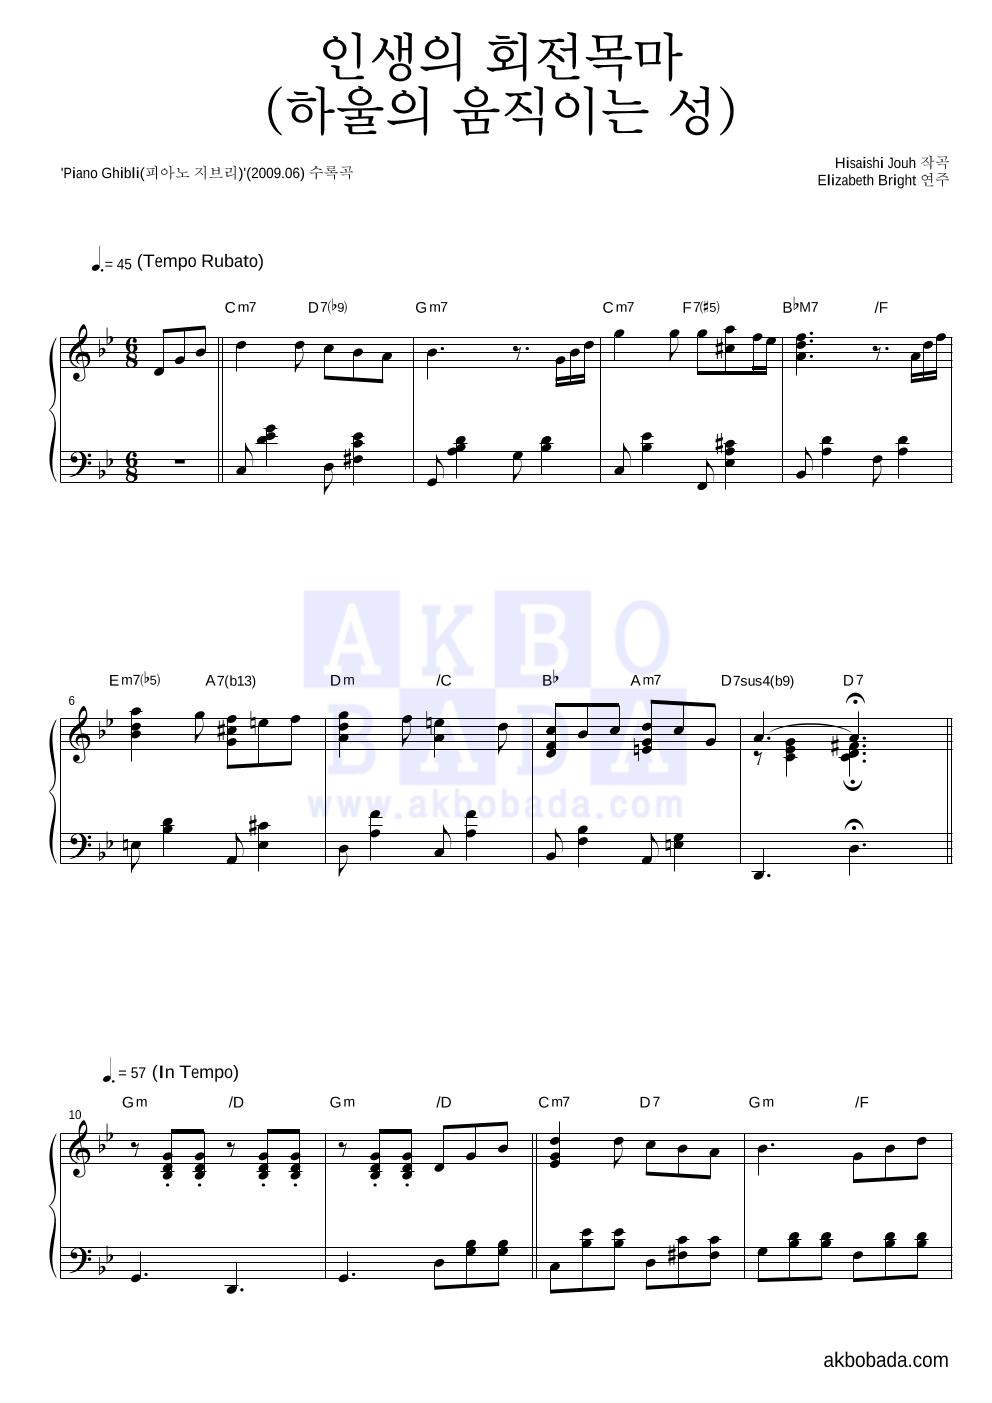 Elizabeth Bright - 인생의 회전목마 (하울의 움직이는 성) 피아노 2단 악보